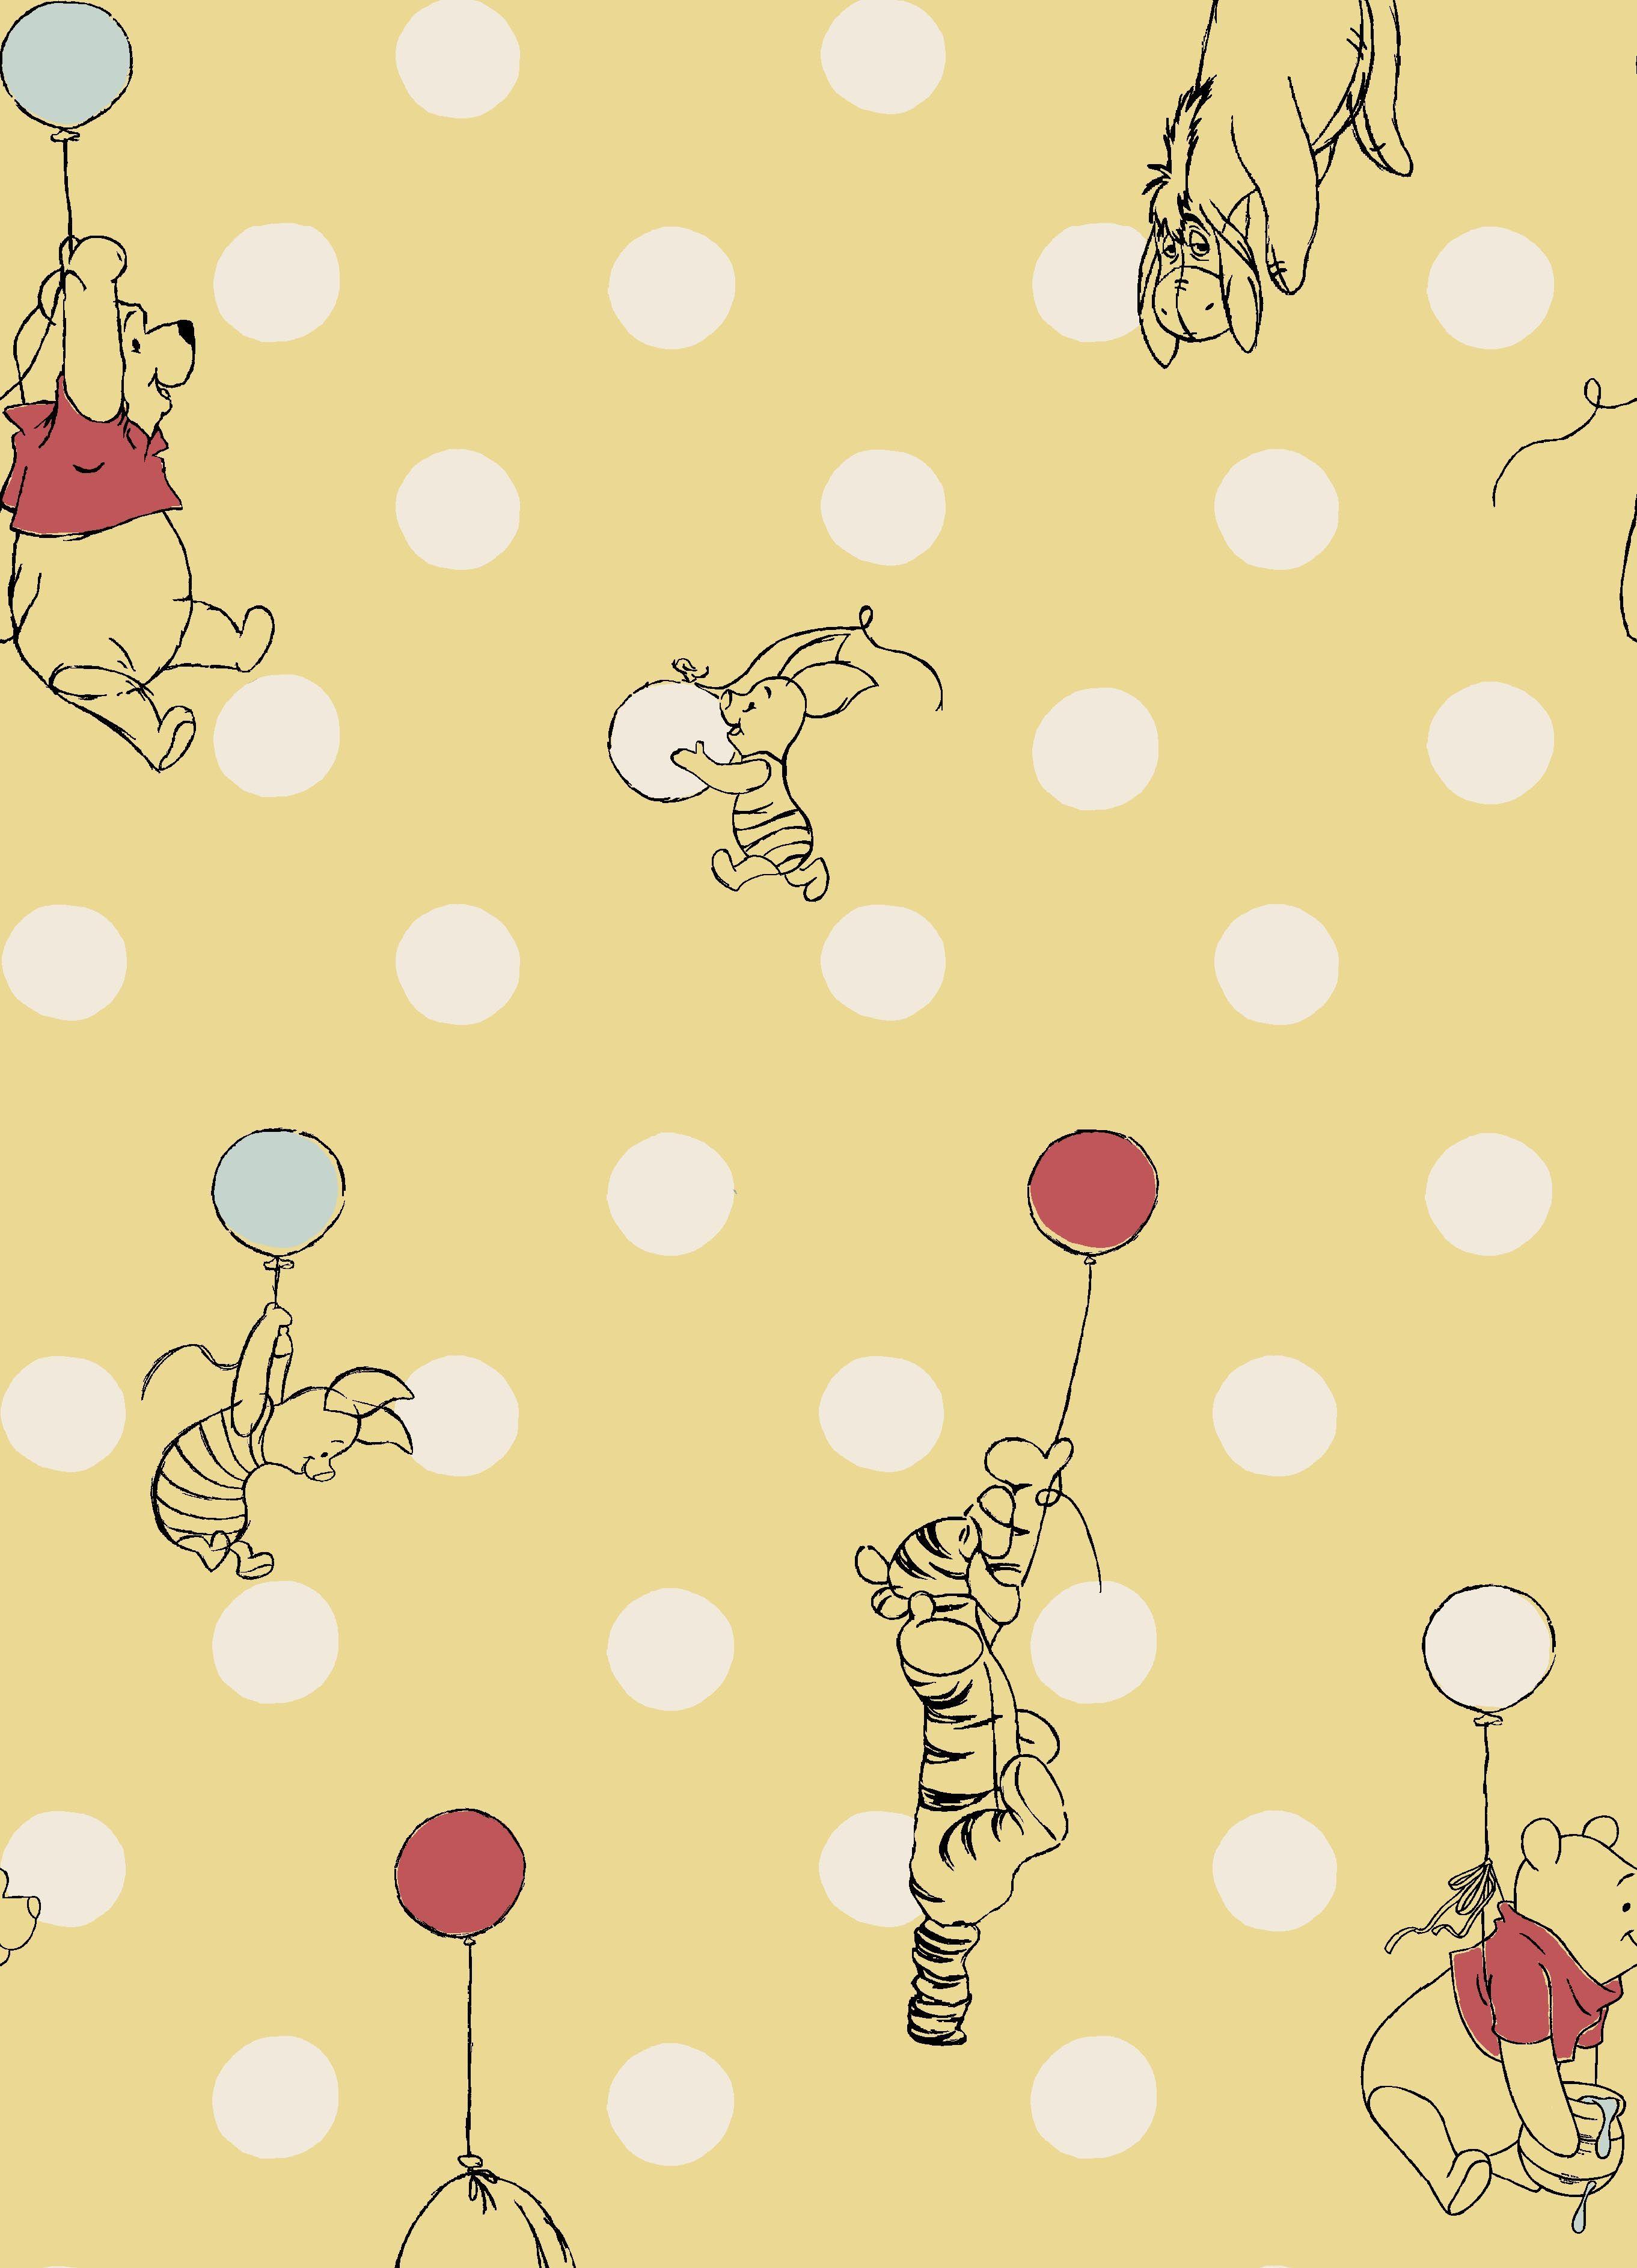 Balloon Spot Winnie The Pooh Background Cath Kidston Wallpaper